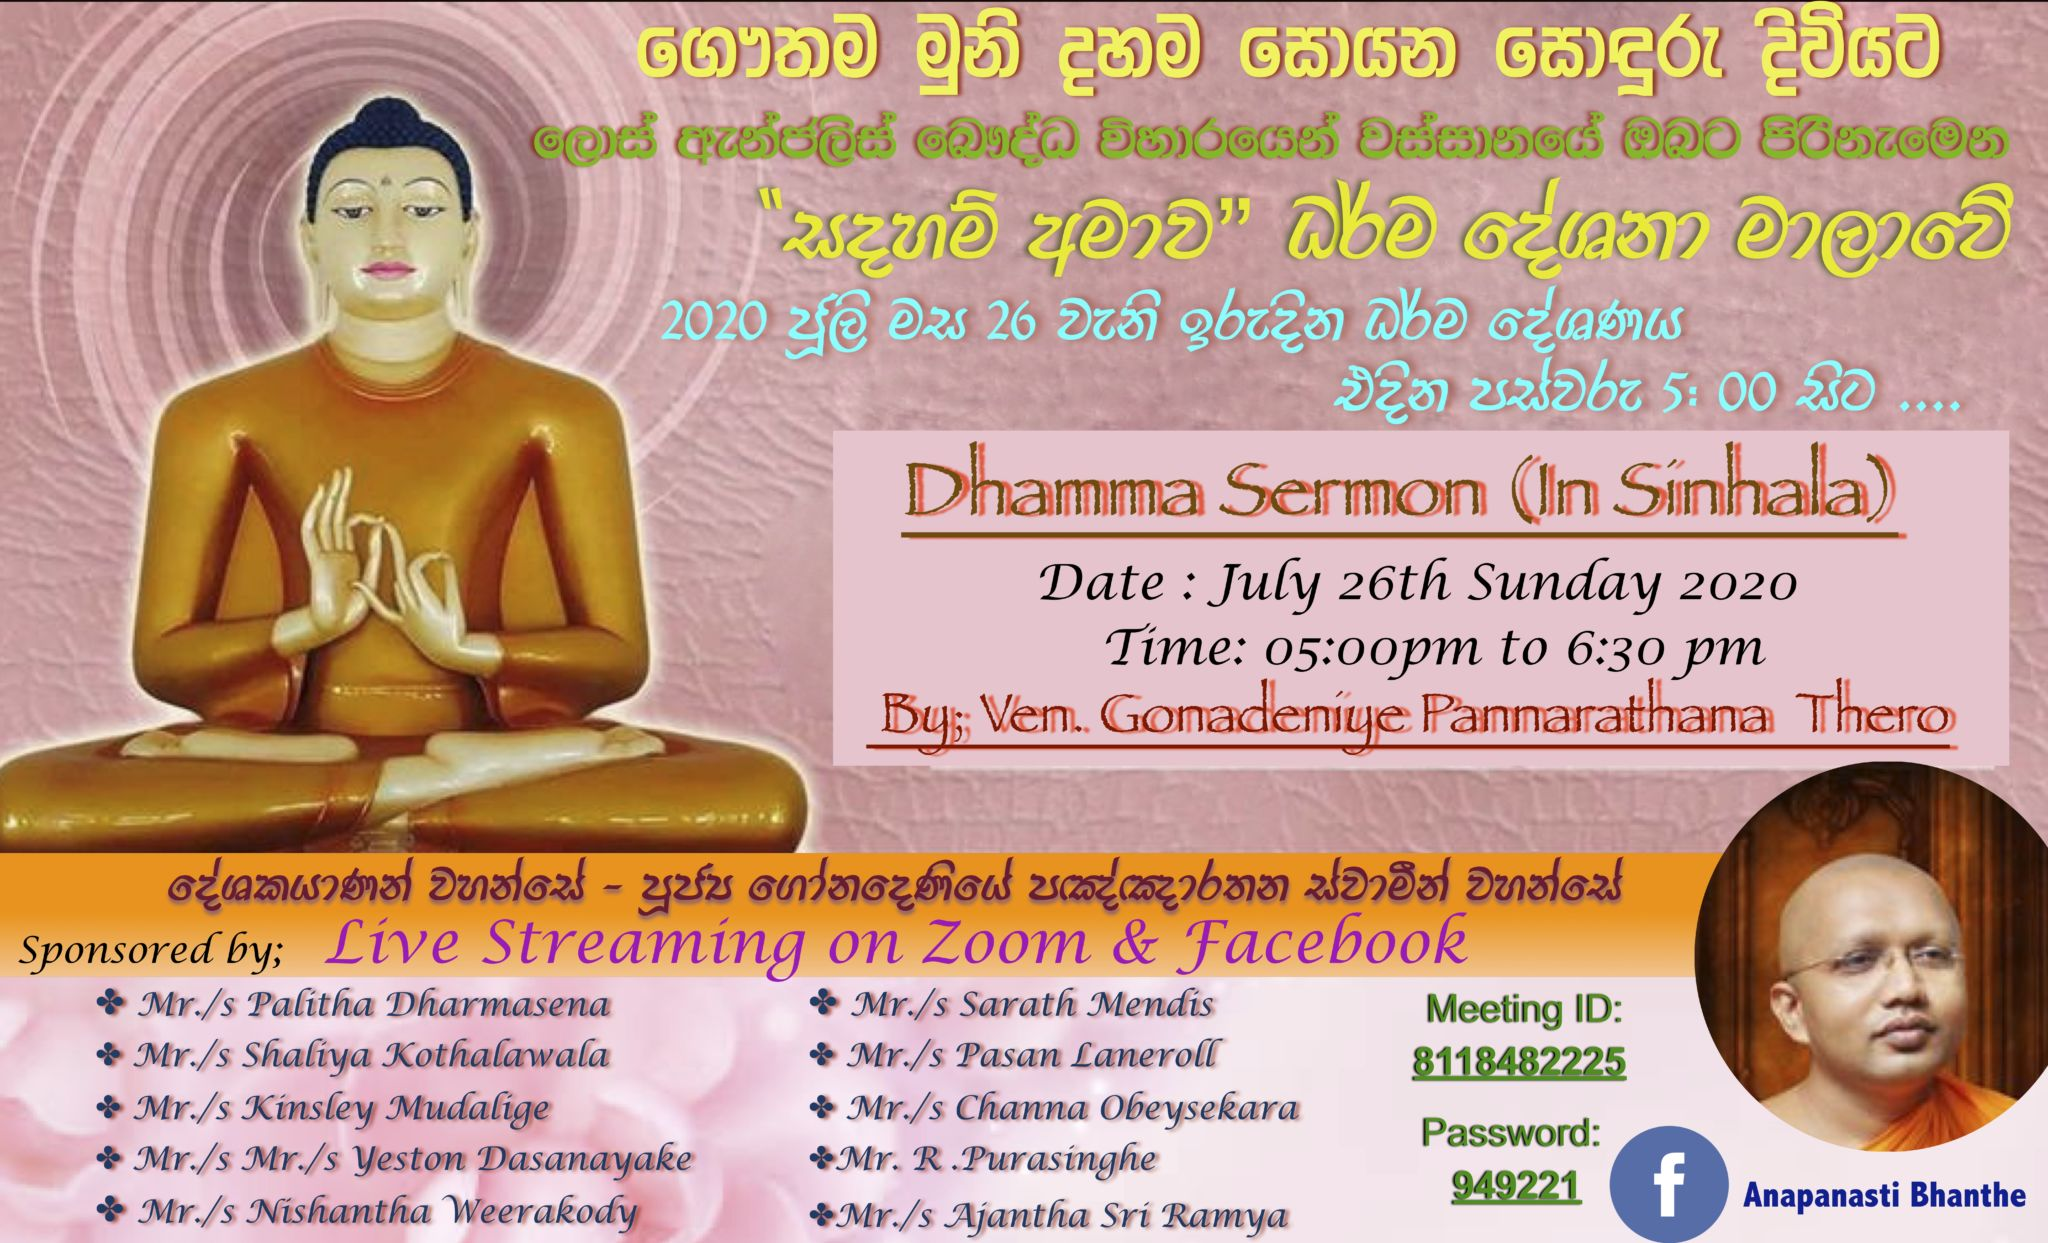 Dhamma Sermon (In Sinhala)